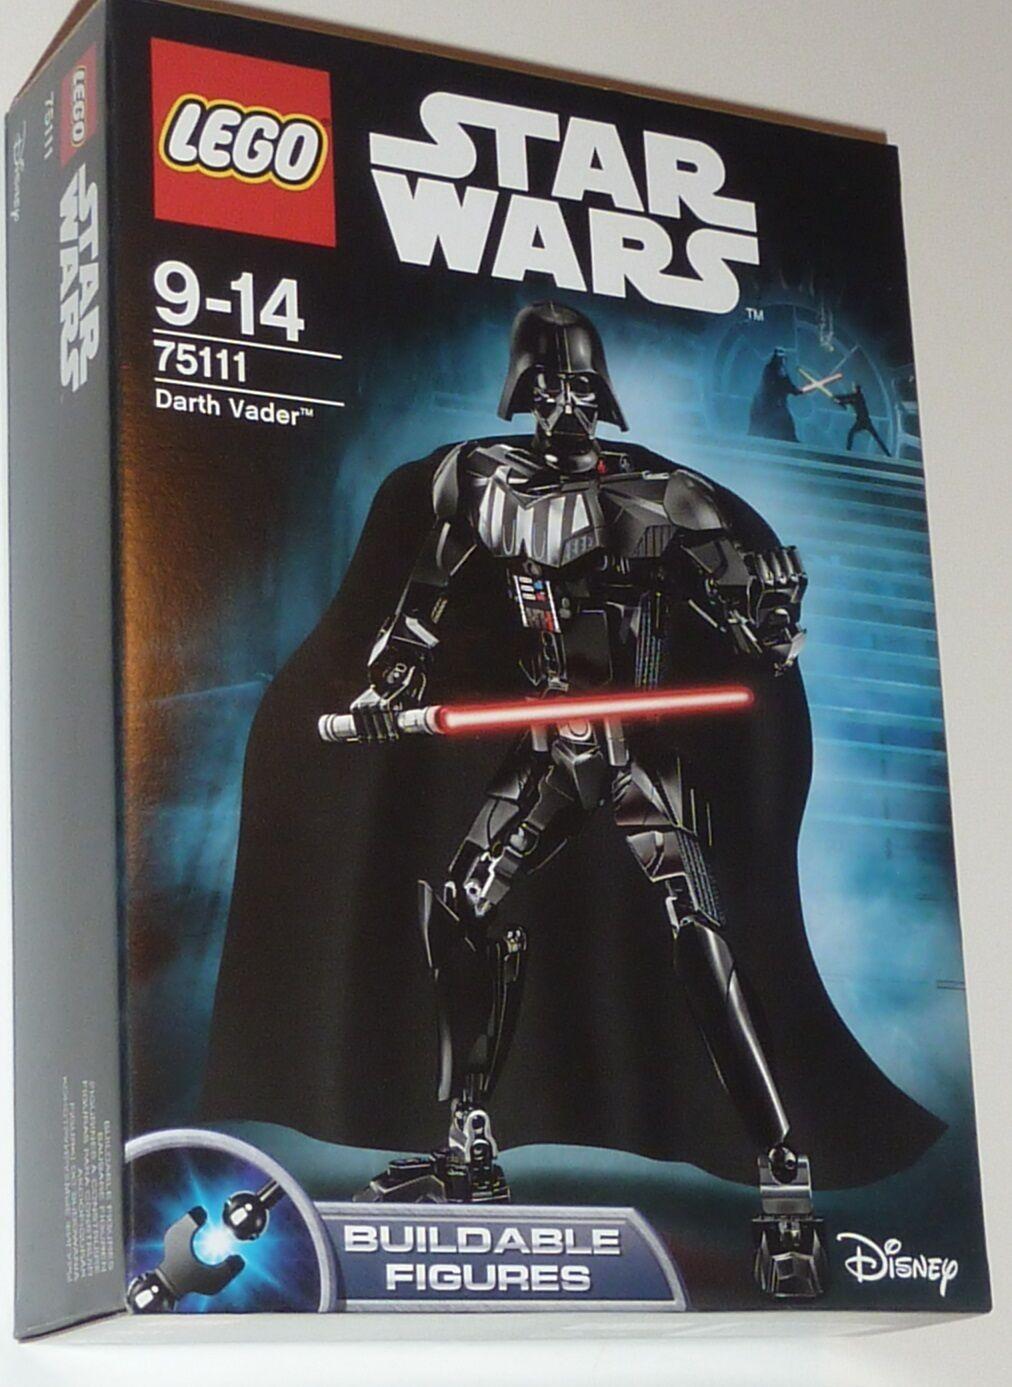 Lego 75111 STAR WARS Darth Vader (formerly Anakin Skywalker) buildable figure